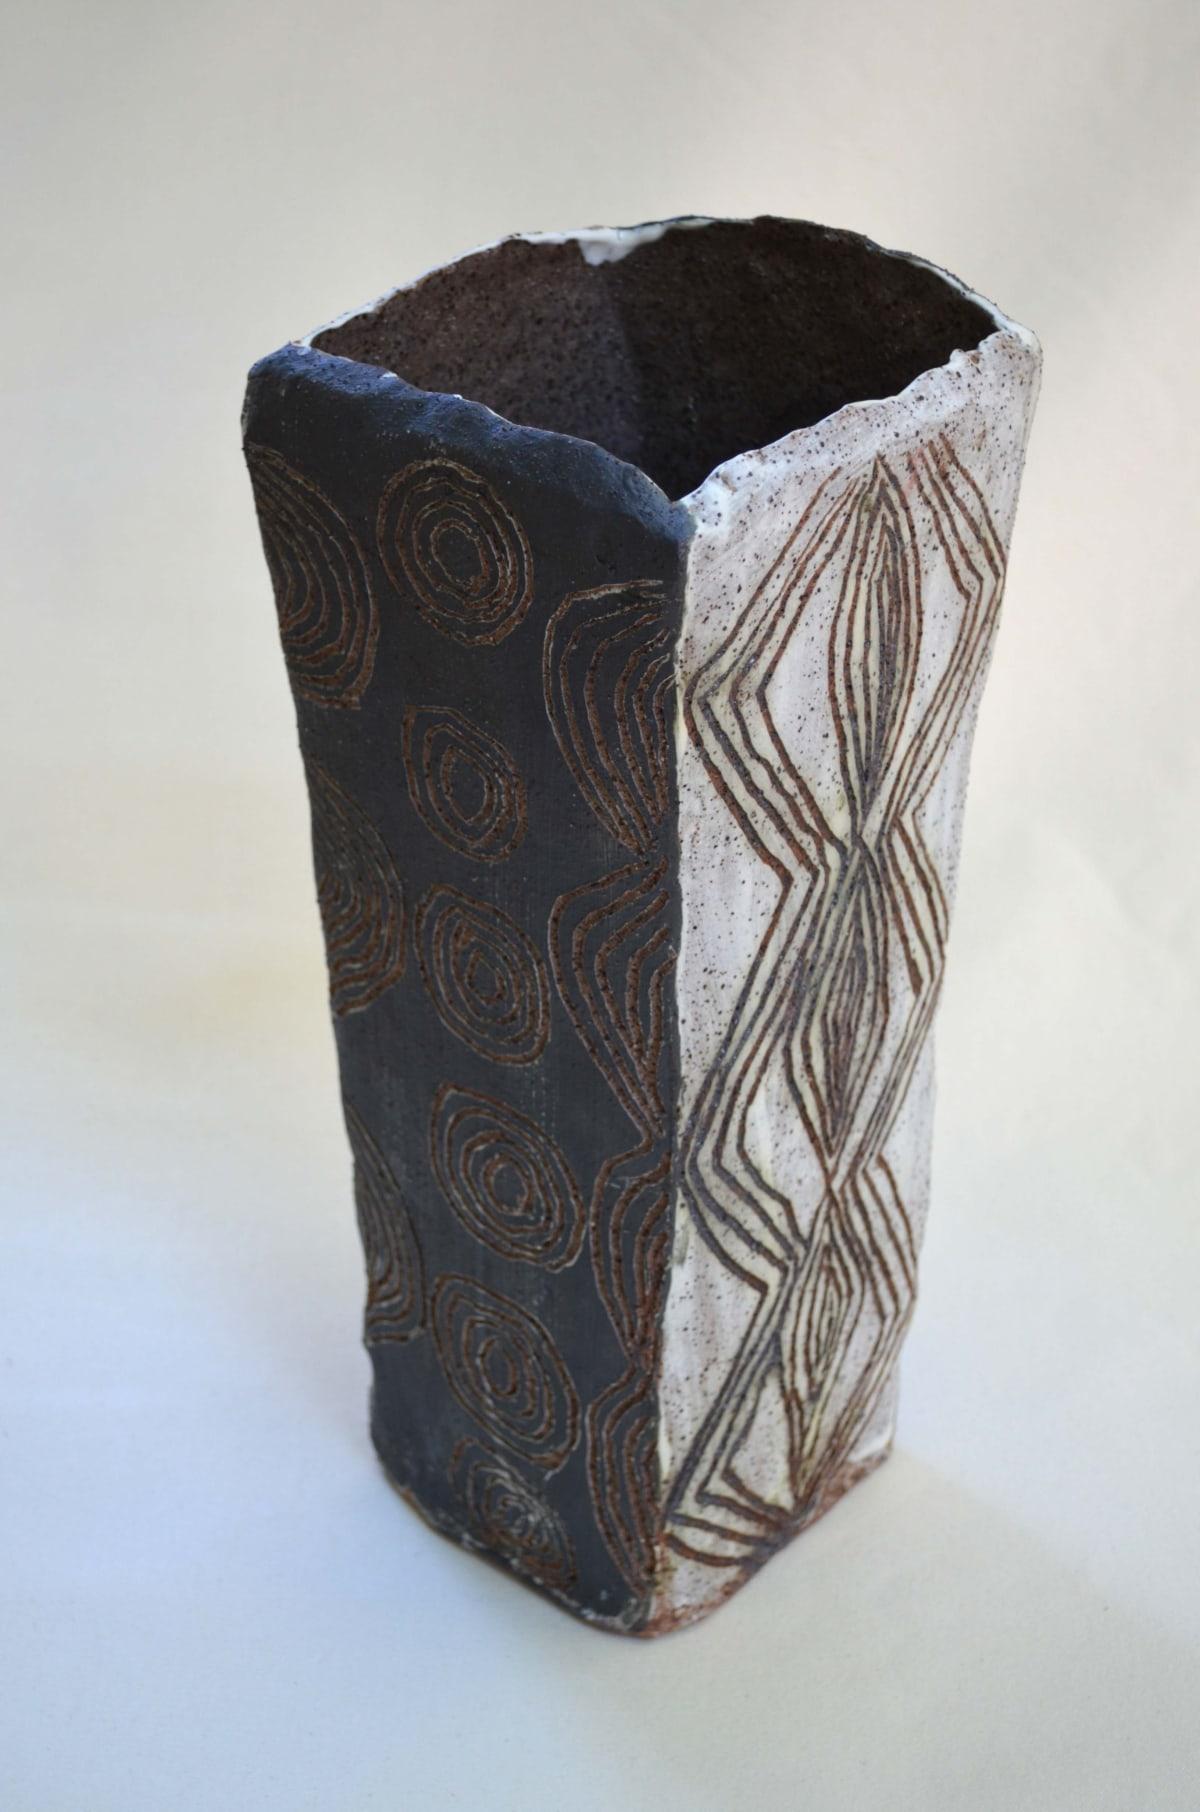 Rupert Jack Maku Maku Stoneware 40 x 22 cm